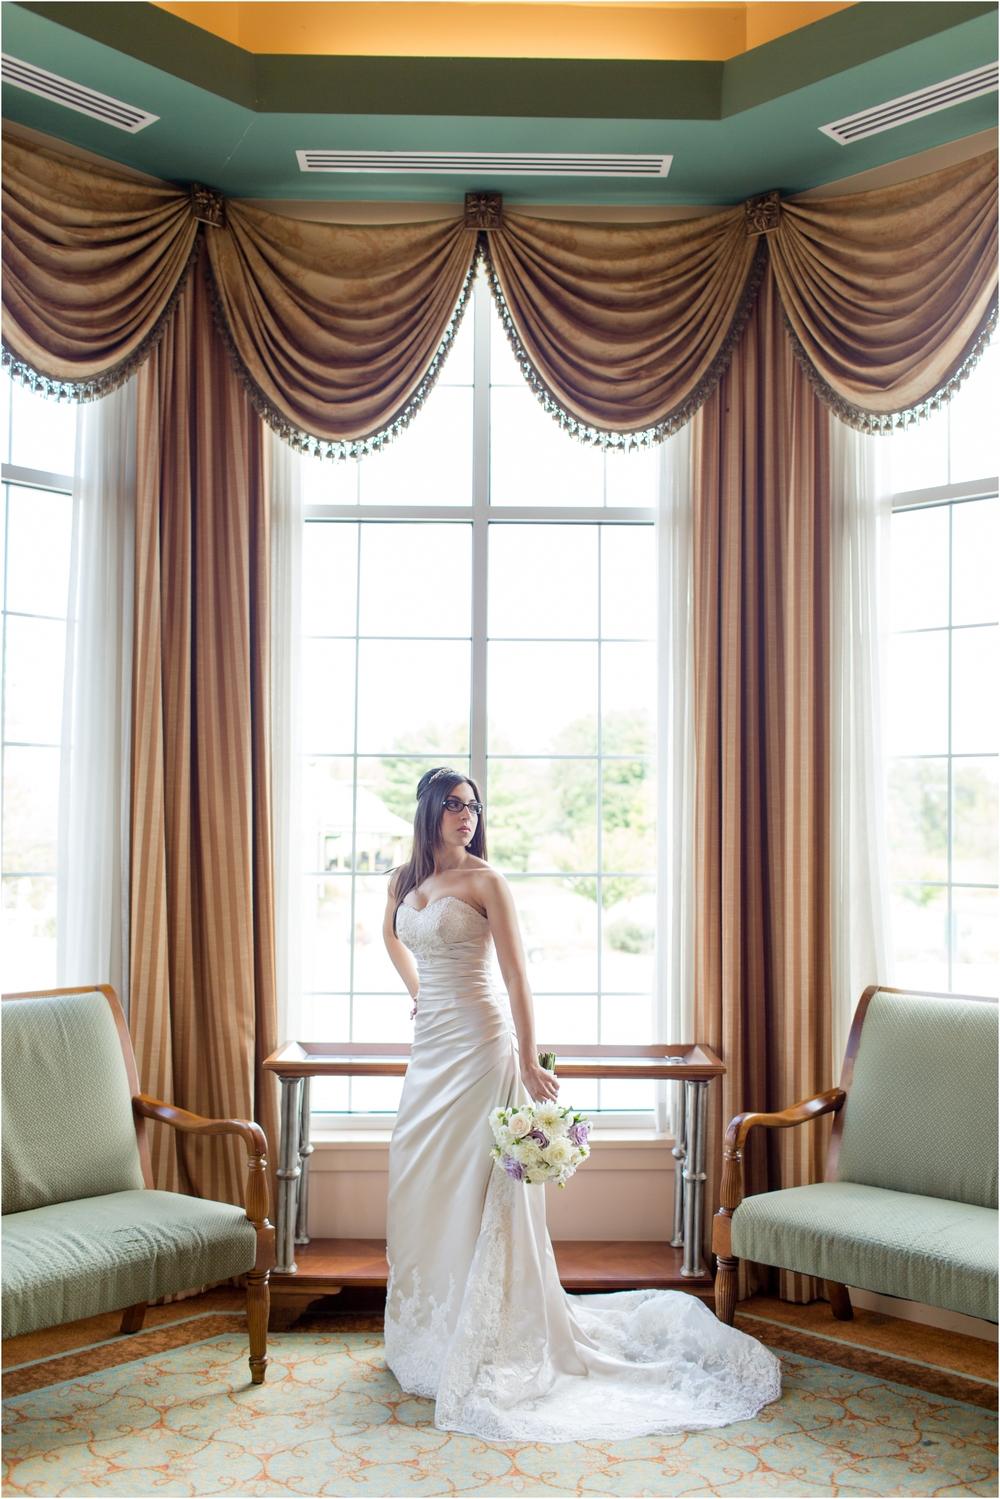 Elhai-Wedding-3-Bride-and-Groom-254.jpg